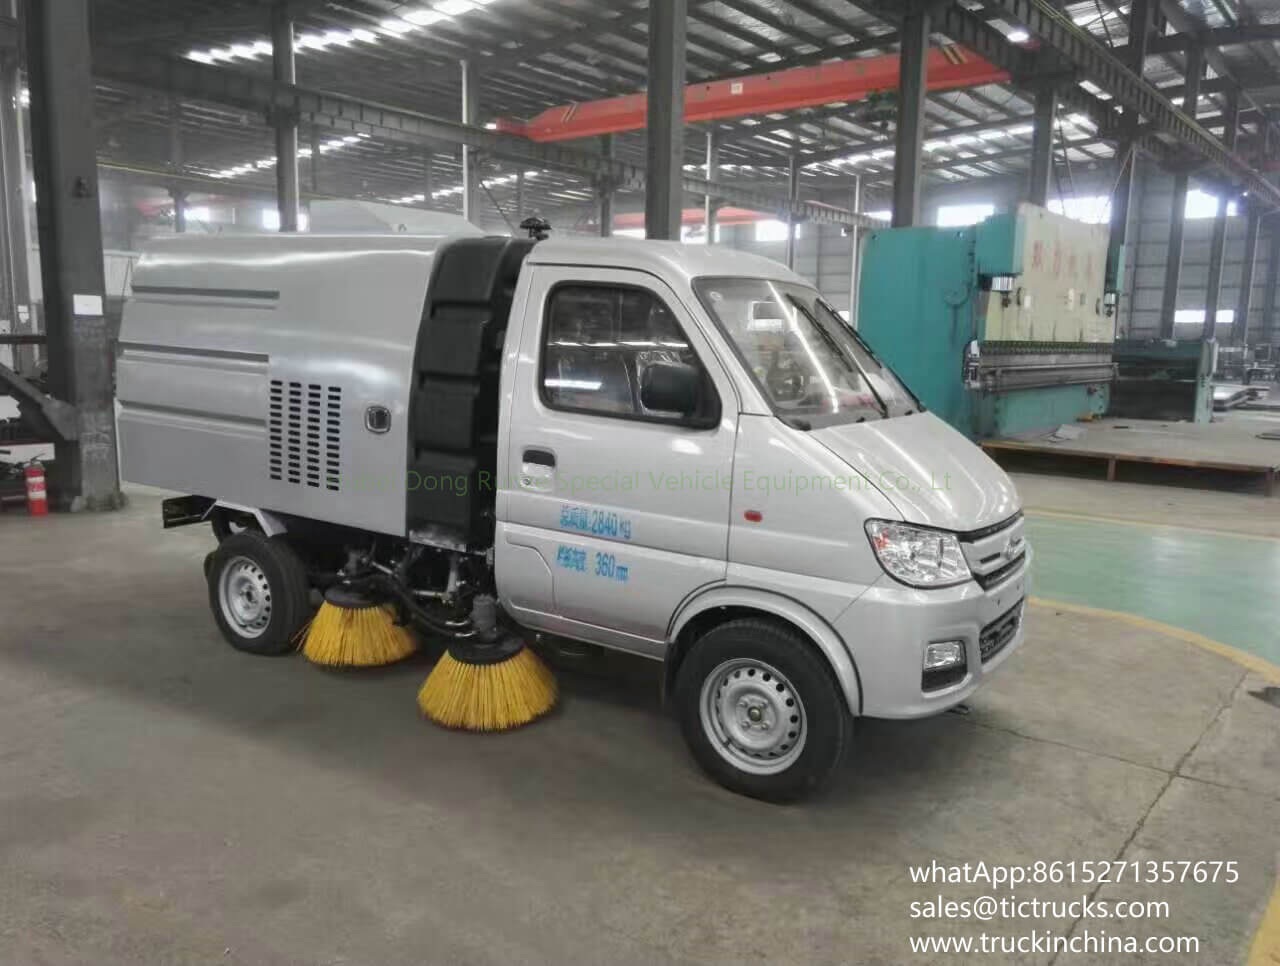 Mini balayeuse de route de la balayeuse vehicle-03T- de Changan trucks_1